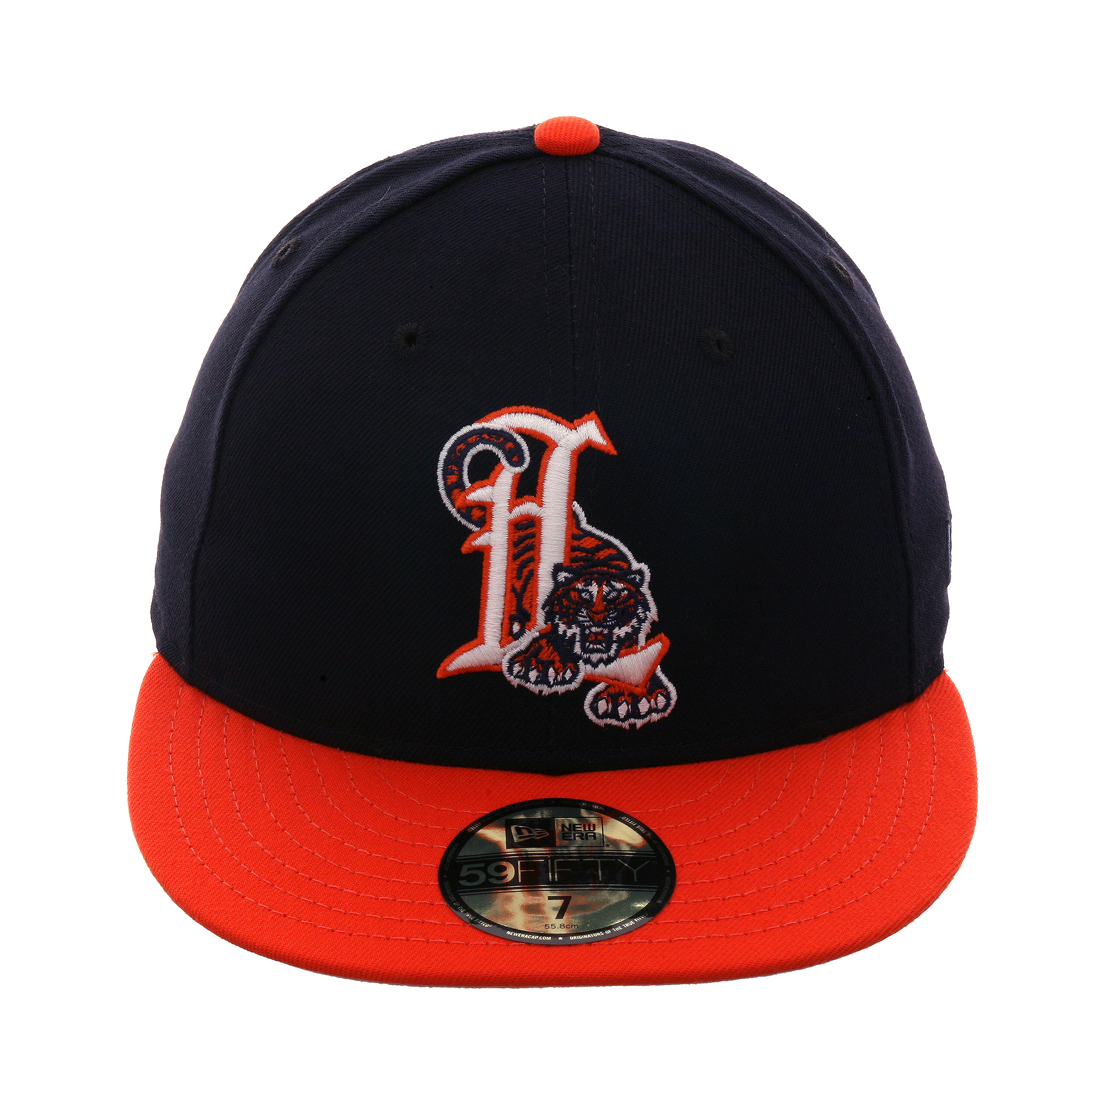 c2c27a9518b Exclusive New Era 59Fifty Lakeland Tigers 1994 Hat